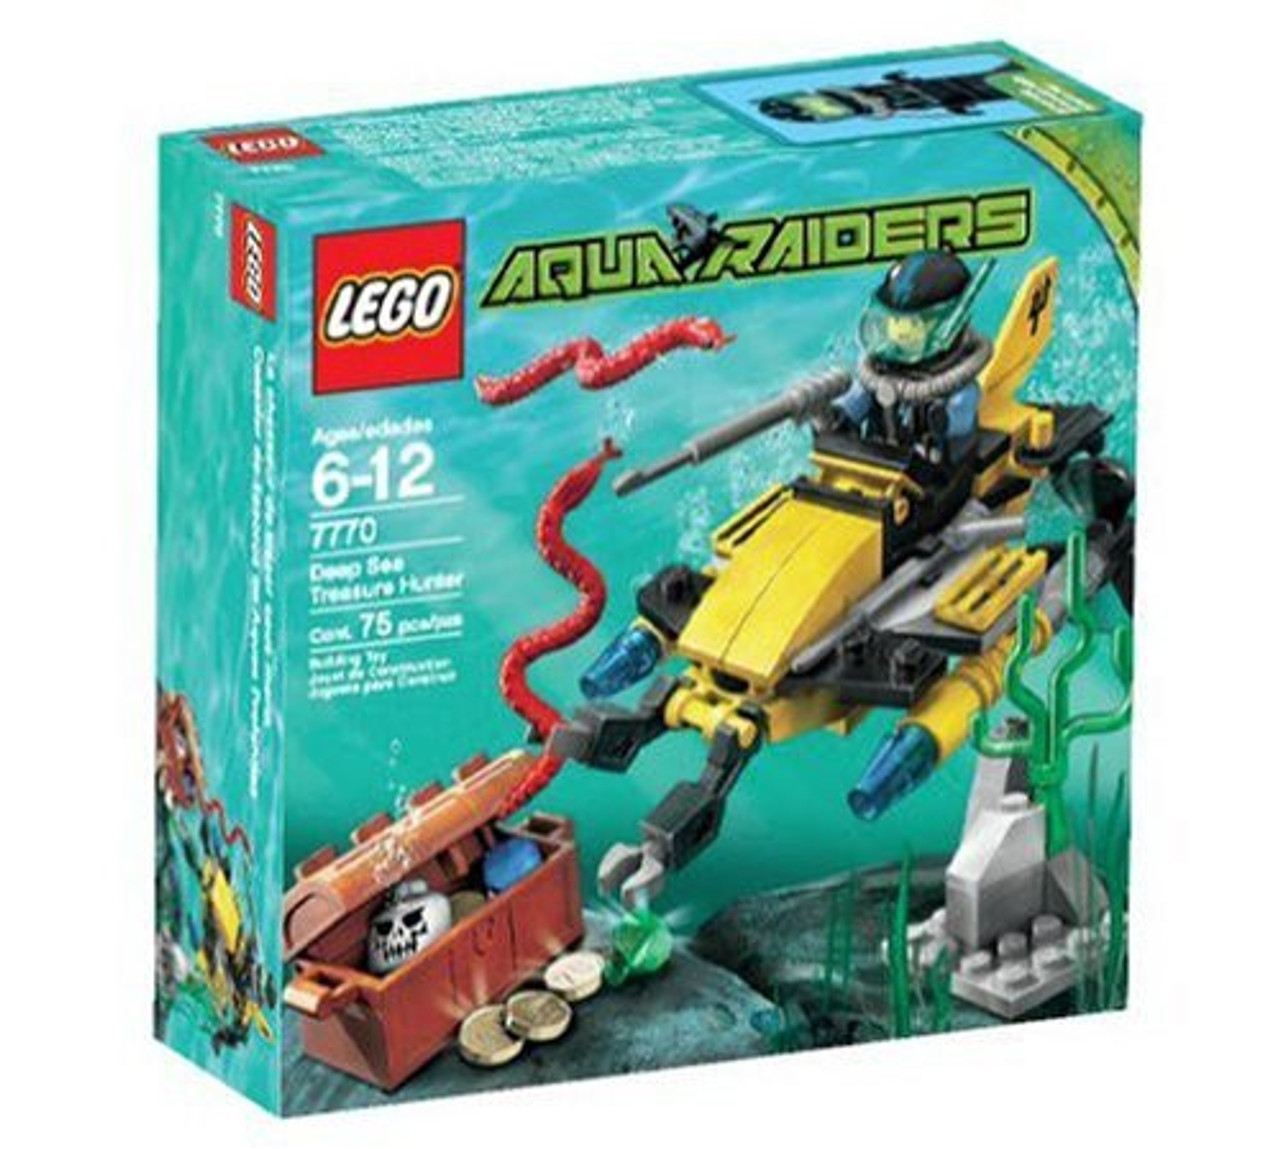 LEGO Aqua Raiders Deep Sea Treasure Hunters Set #7770